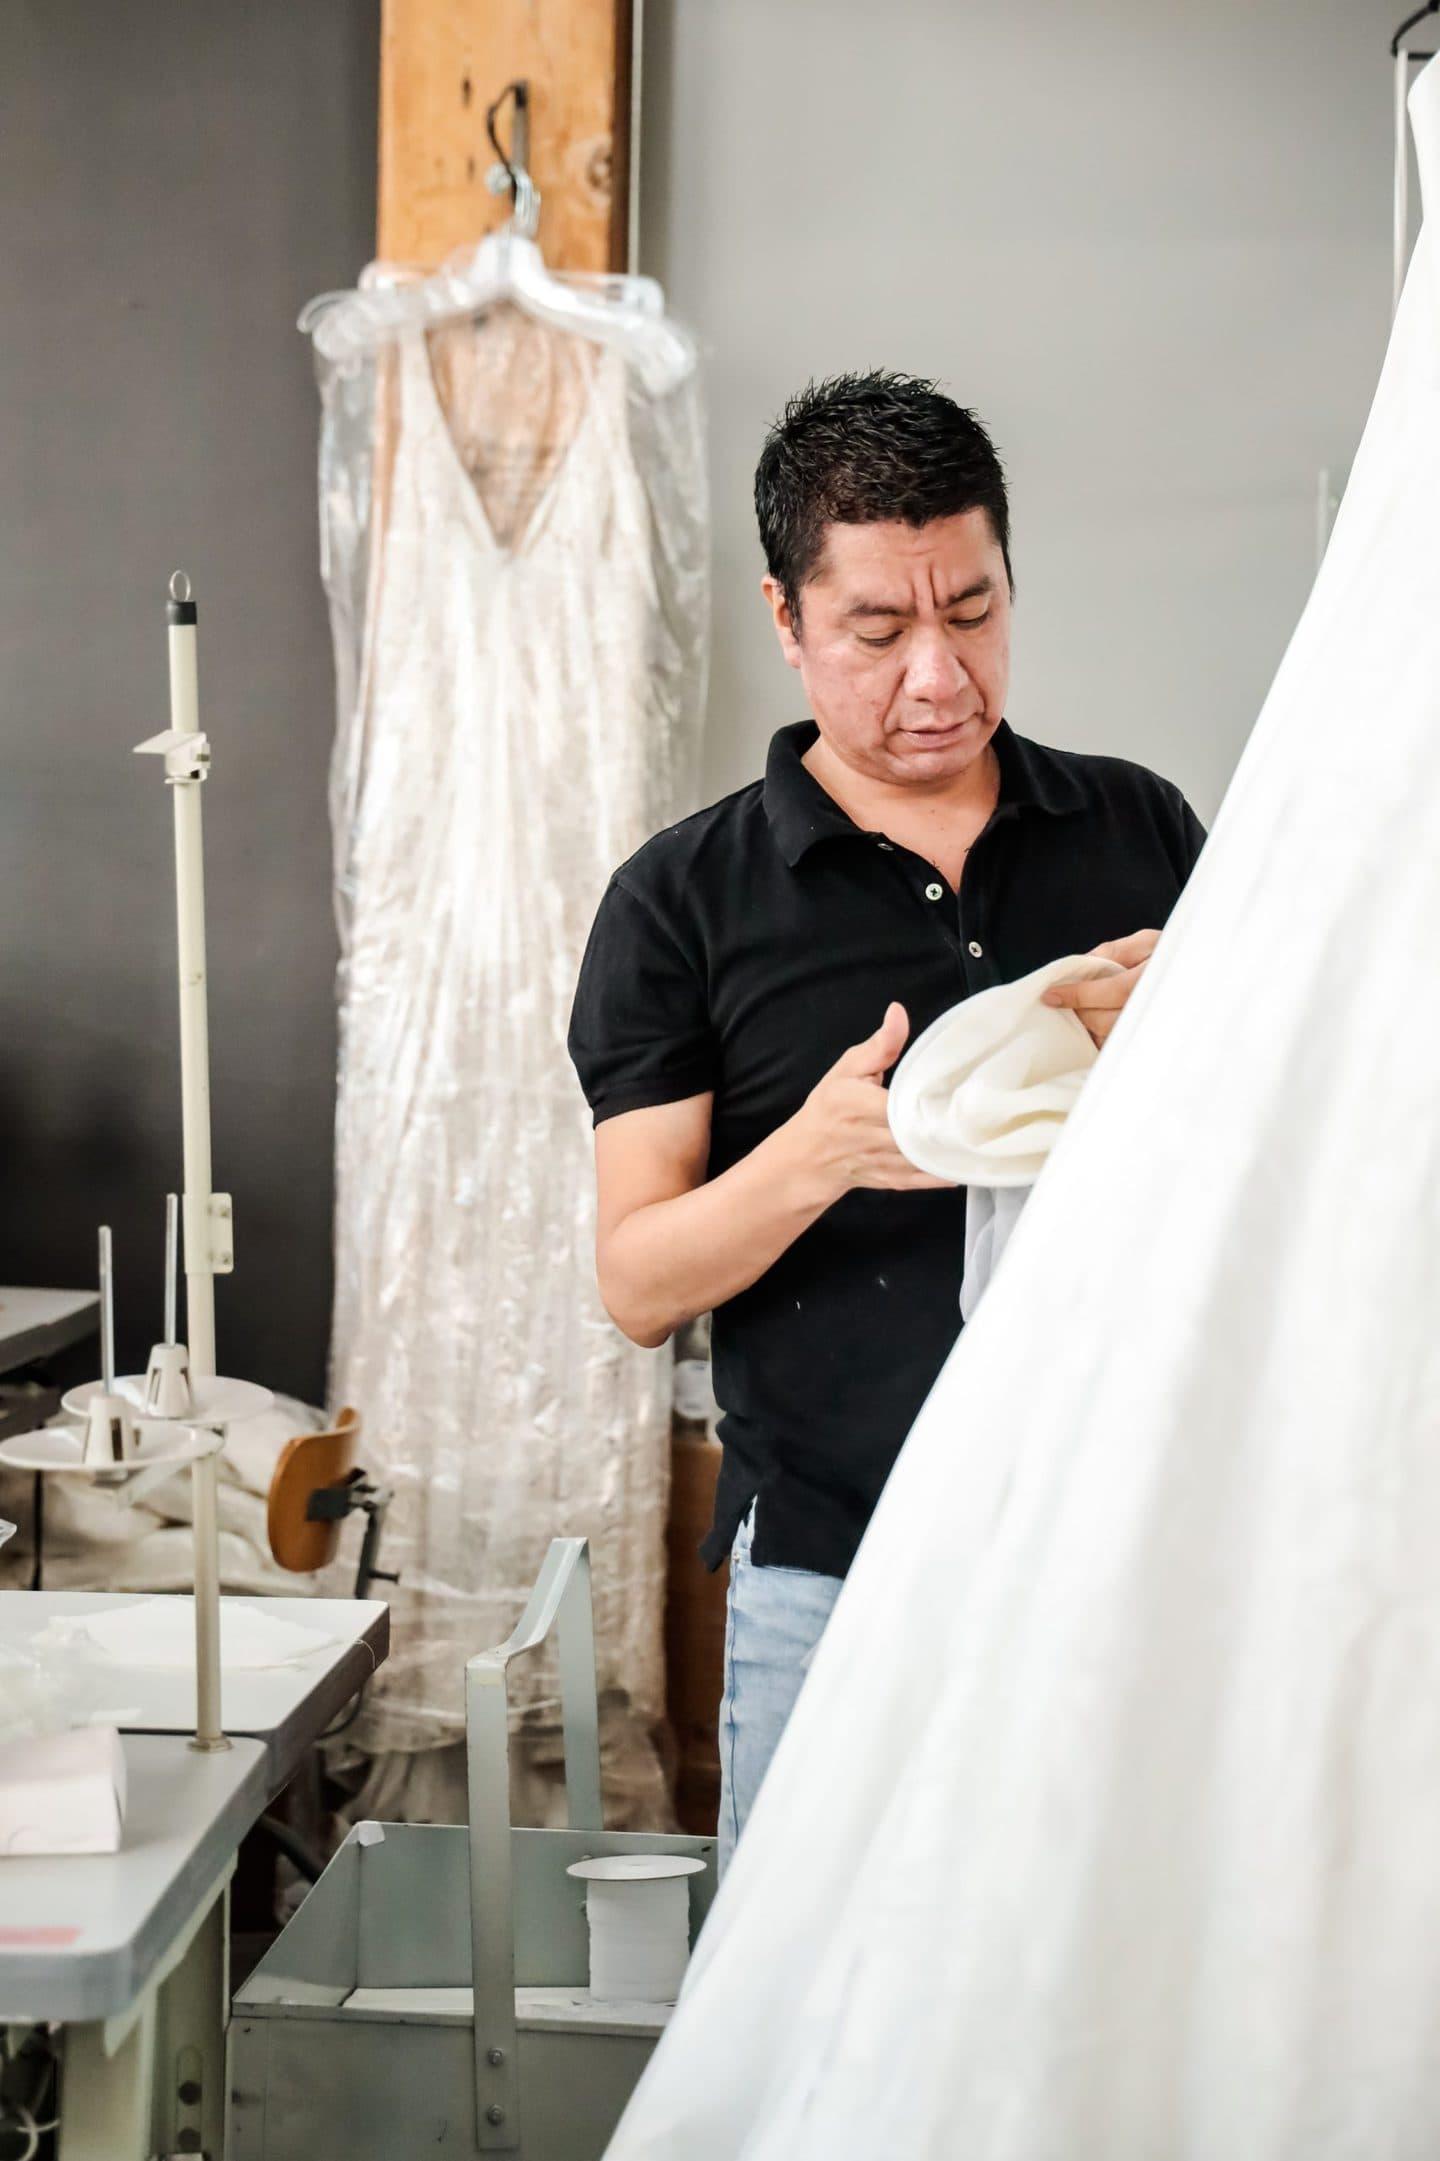 A Los Angeles pattern maker examining bespoke clothing